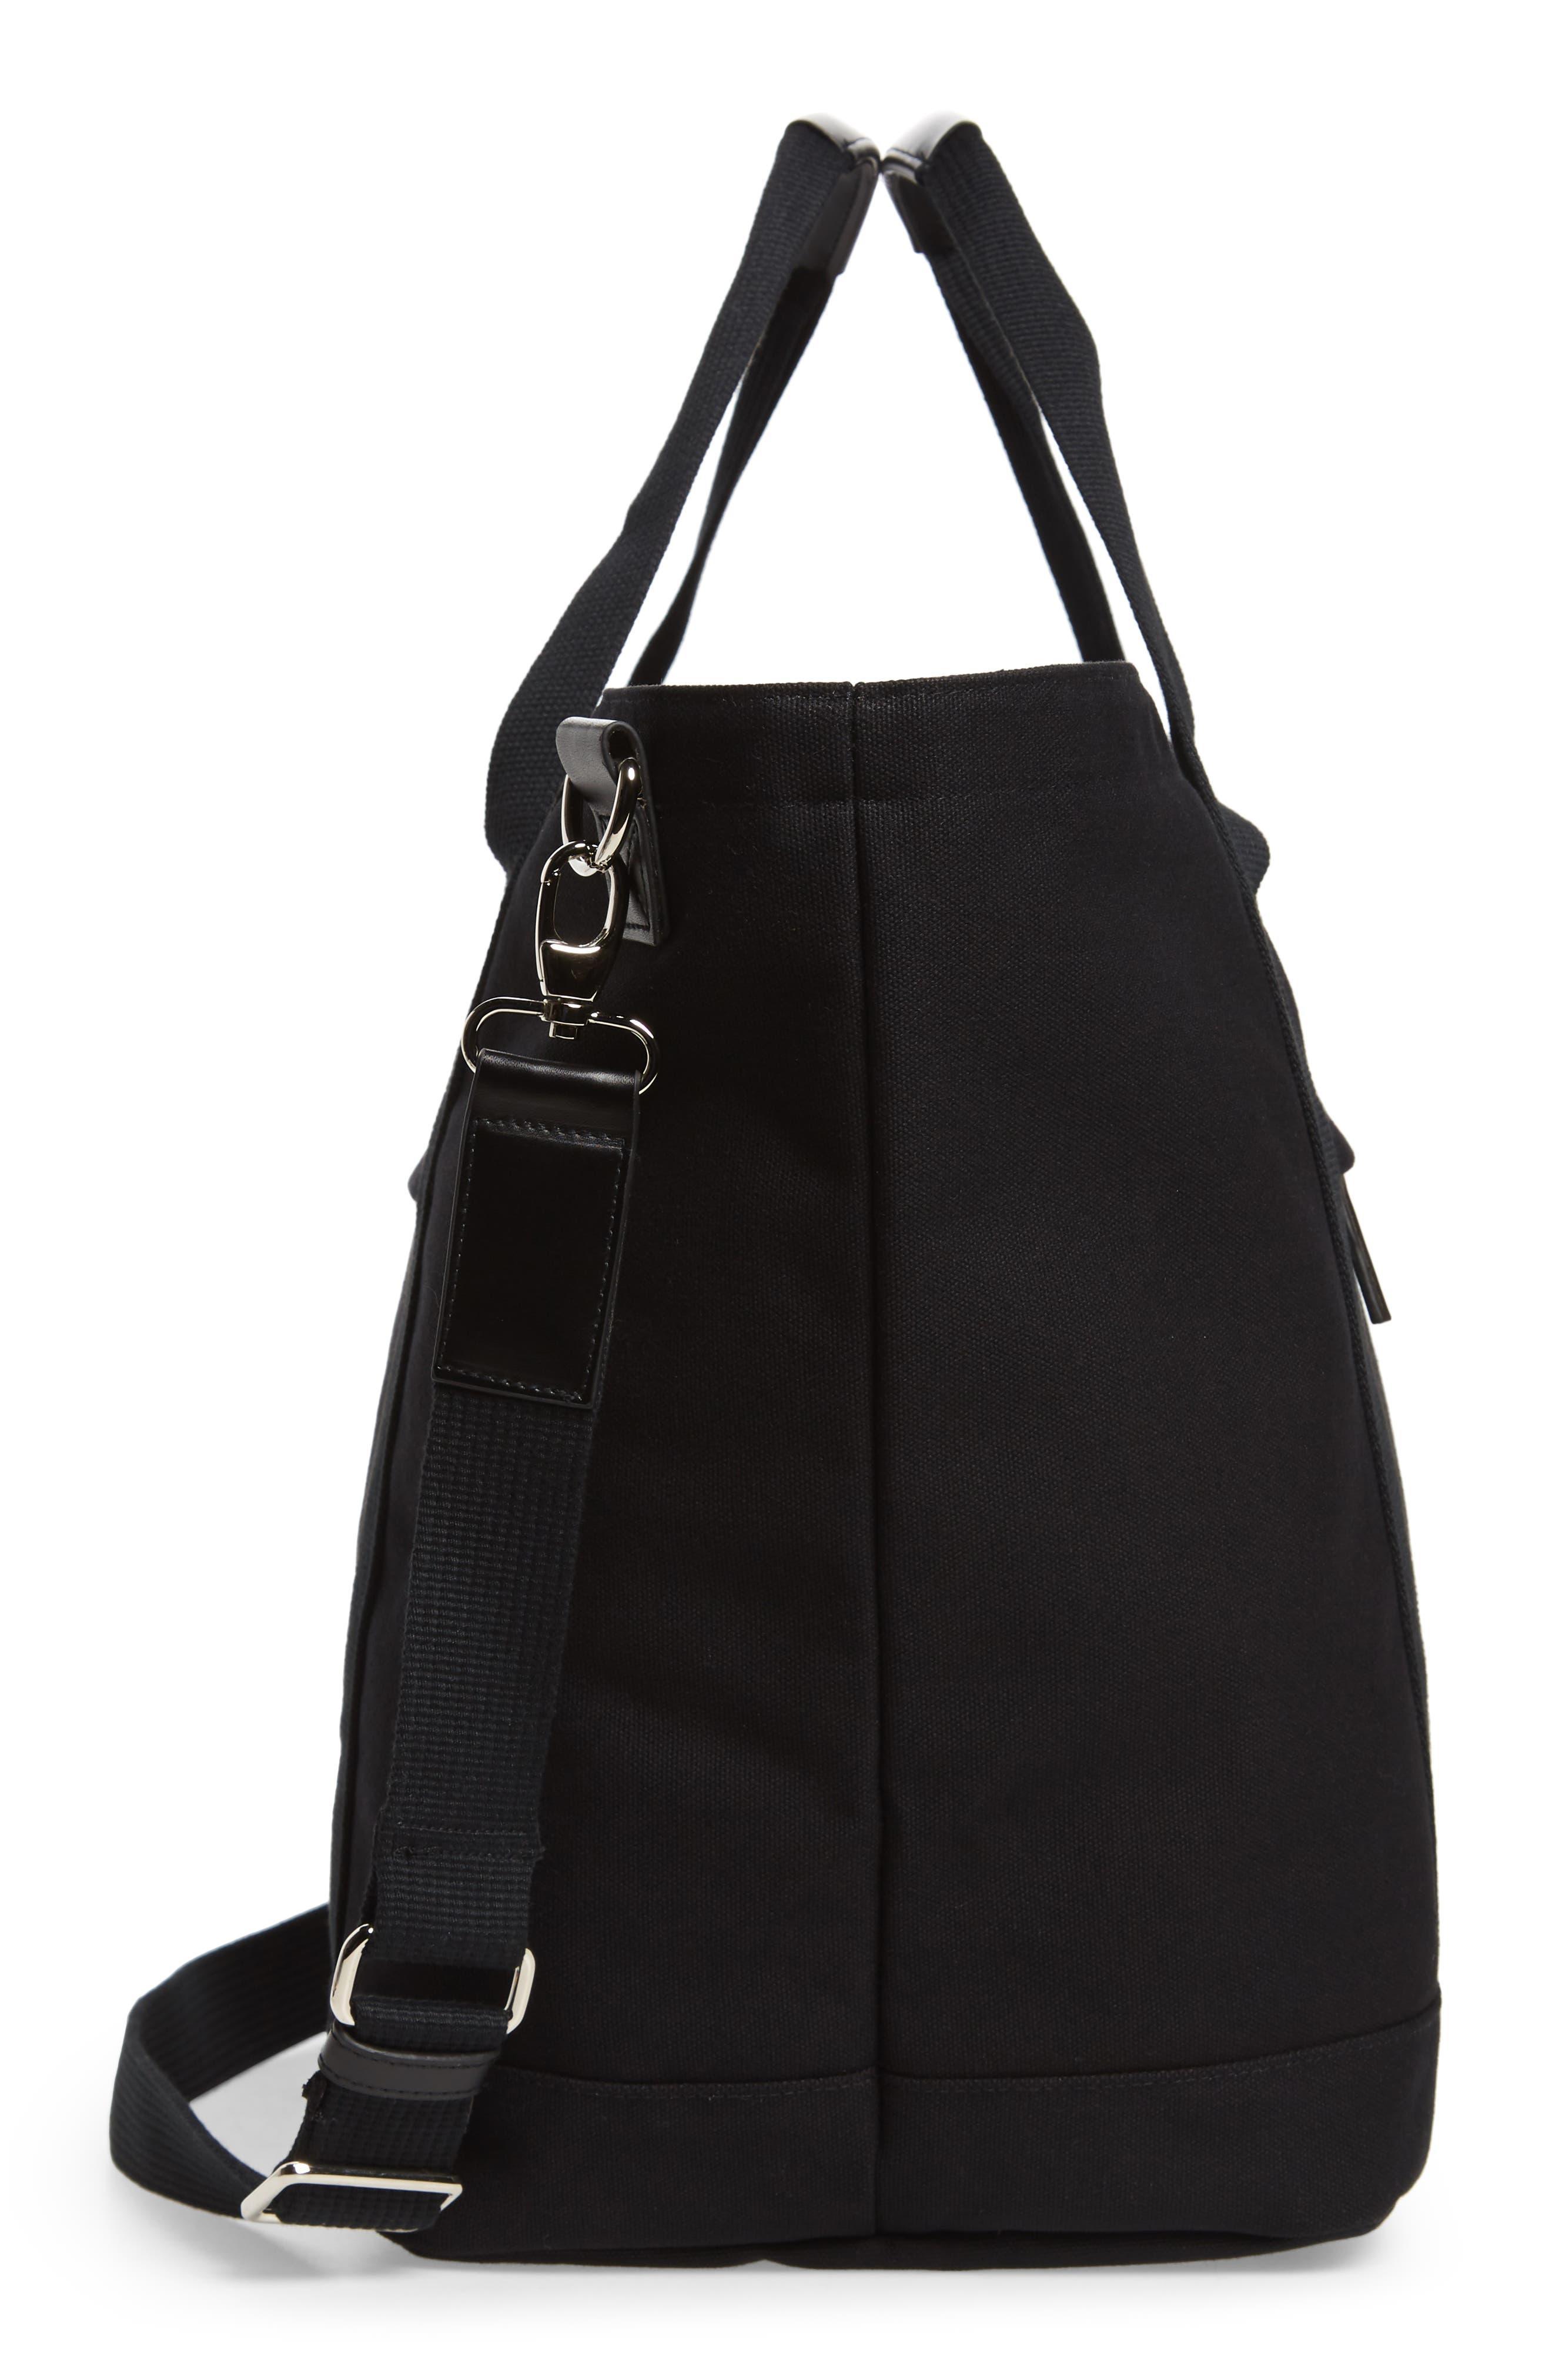 Weekend Water Repellent Tote Bag,                             Alternate thumbnail 5, color,                             Black